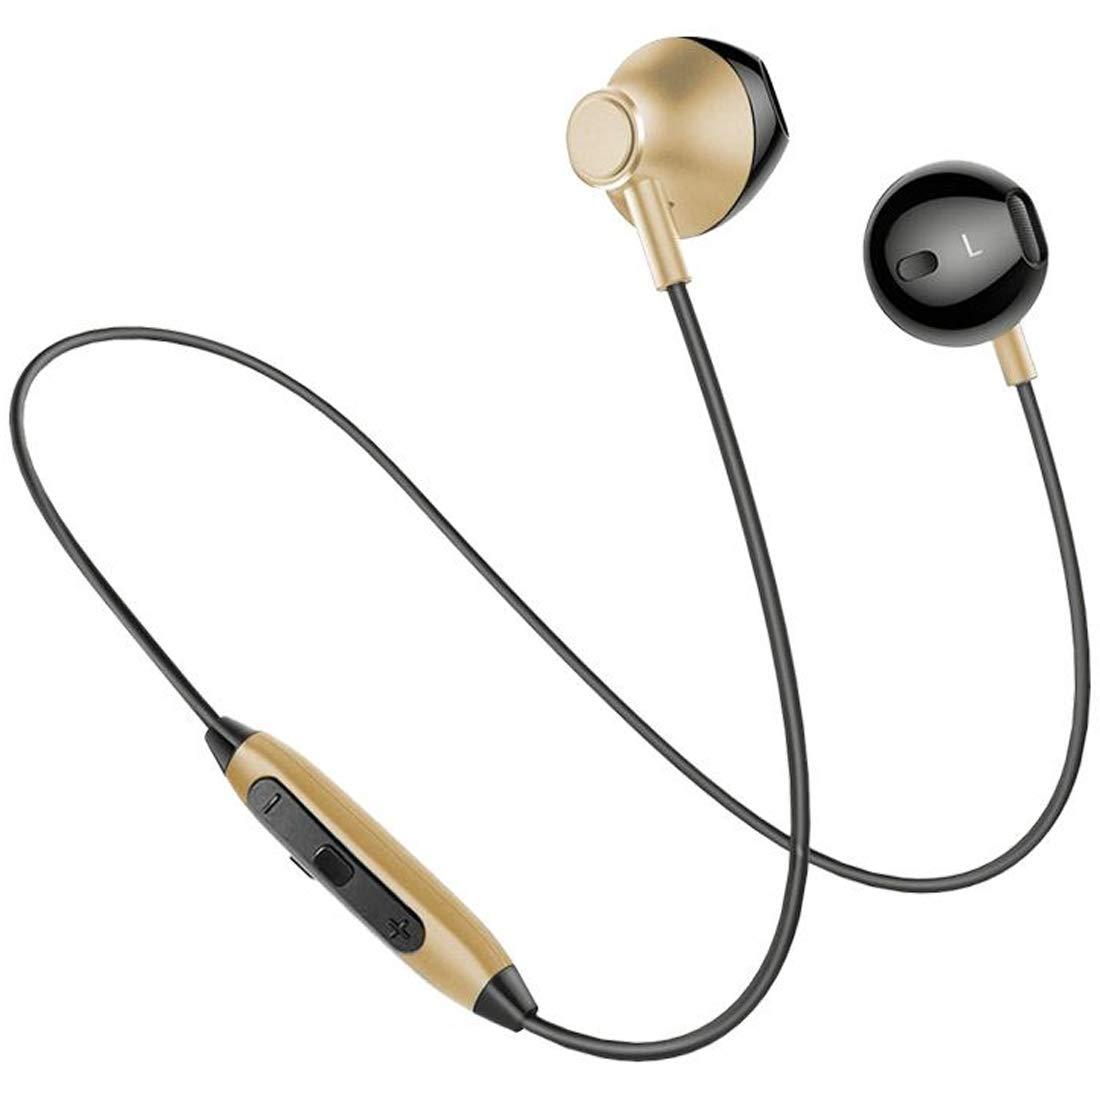 PTron Intunes Pro Headphone Magnetic Earphone Wireless